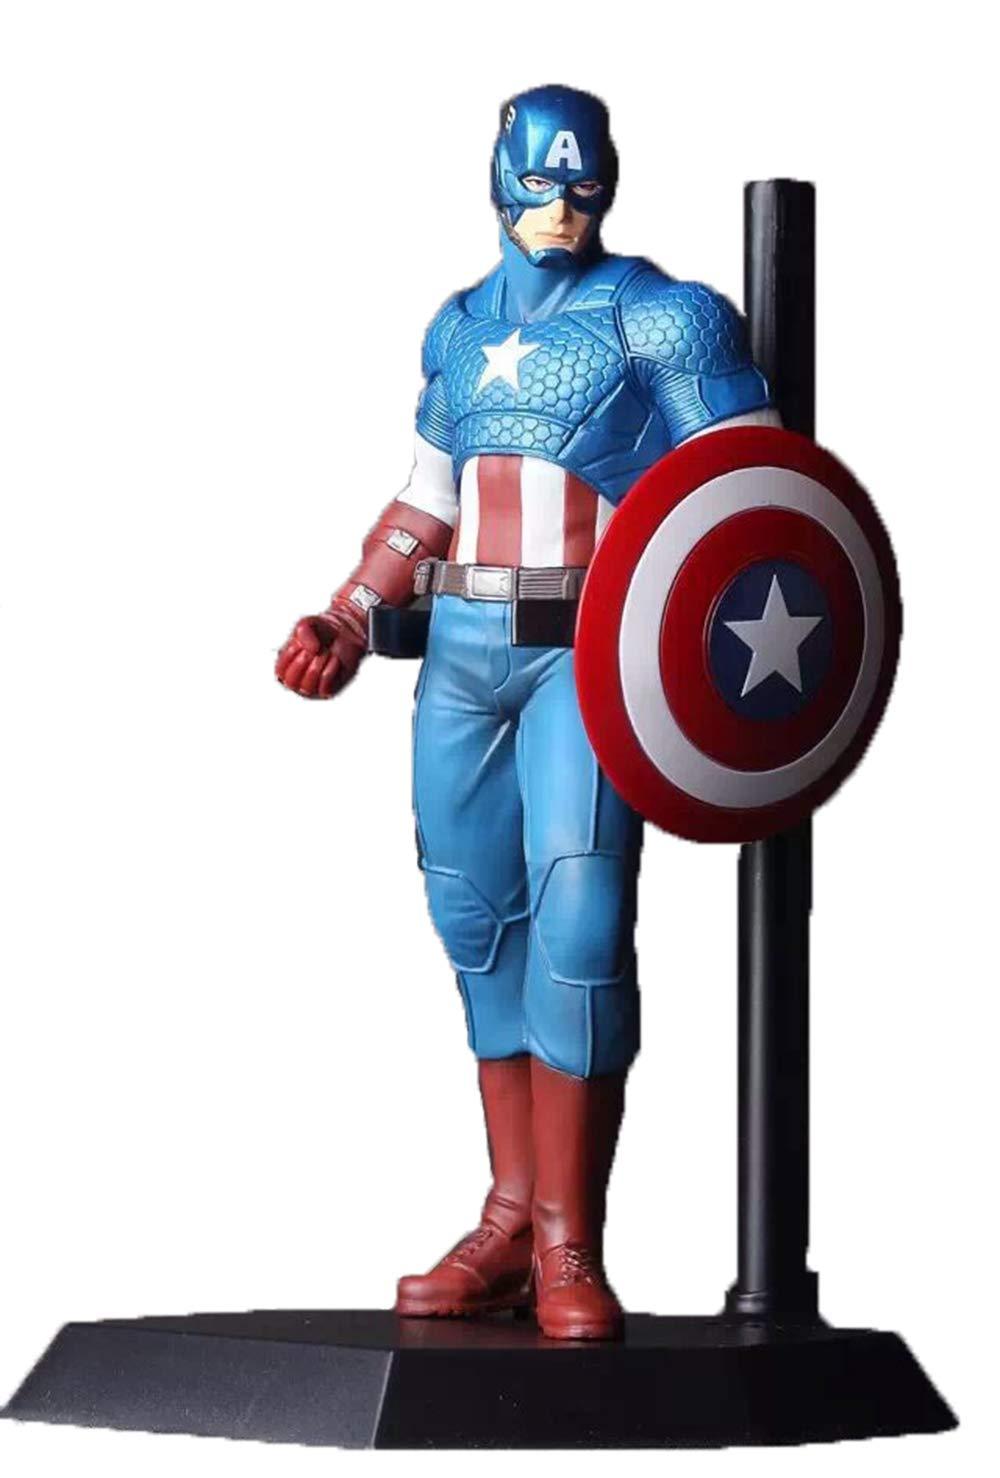 WYZBD Anime Hand Office Avenger Union Captain America Model Decoration 23cm